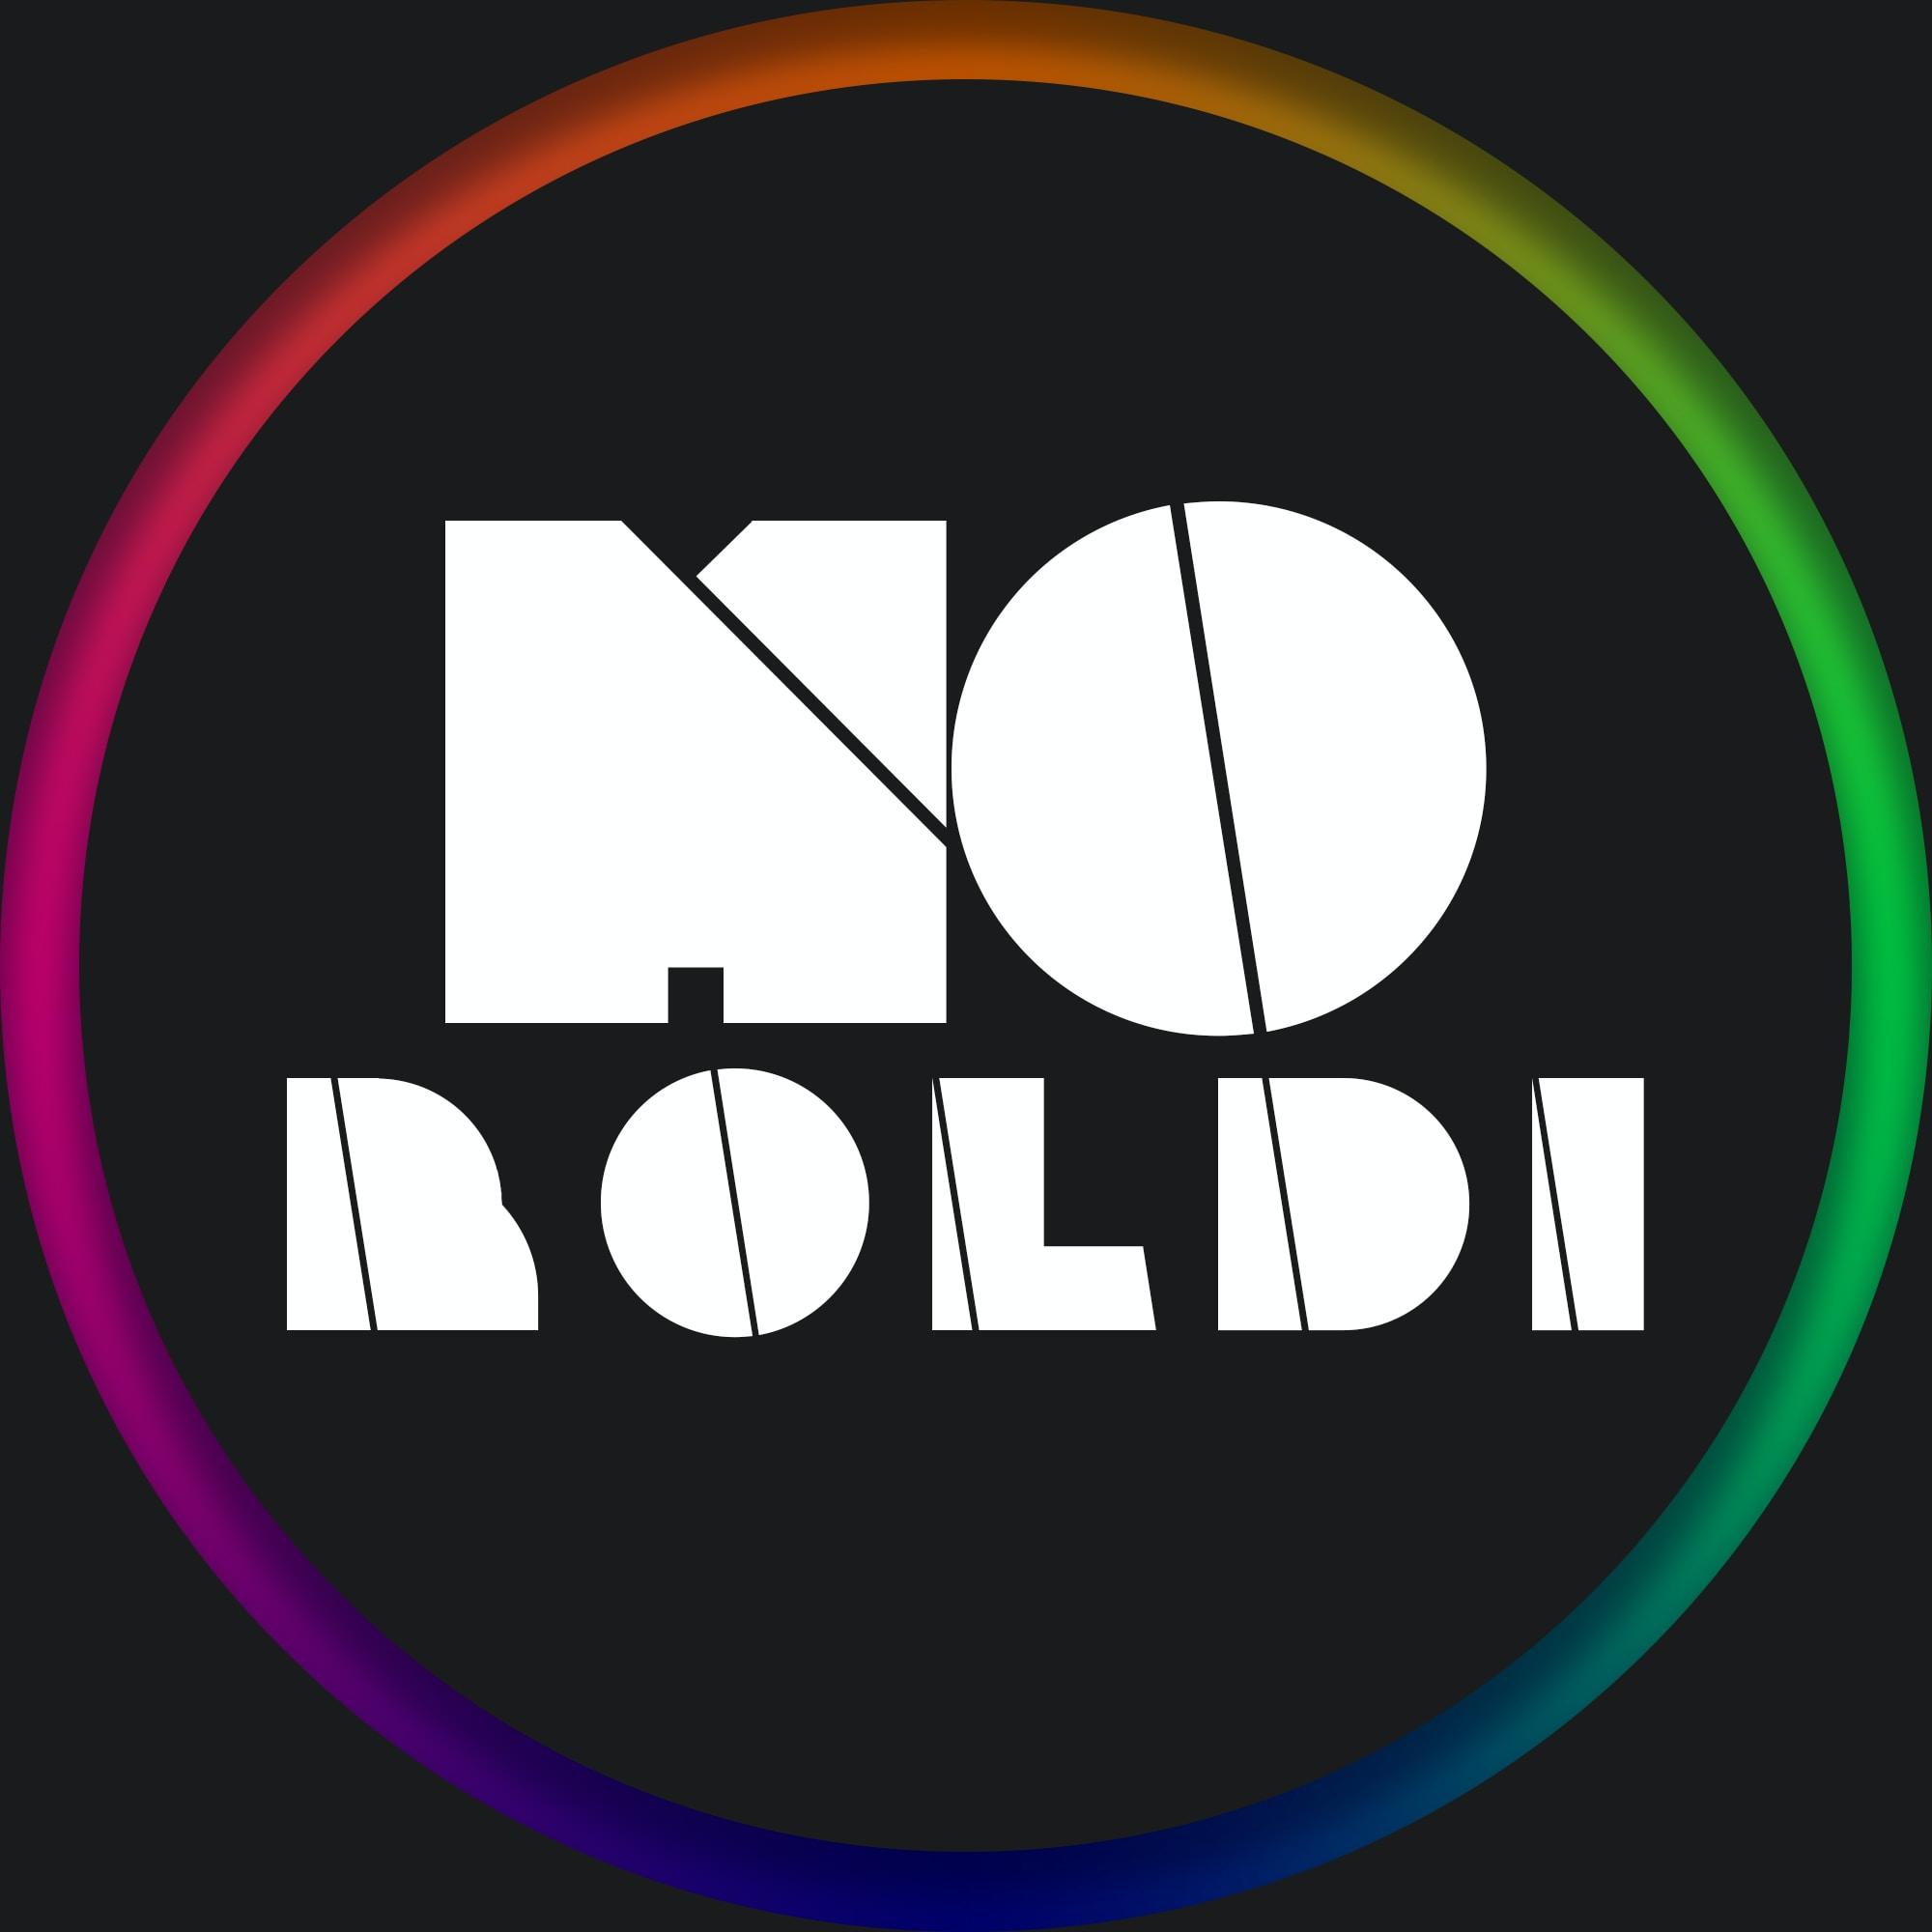 Go to Moritz Weibold's profile